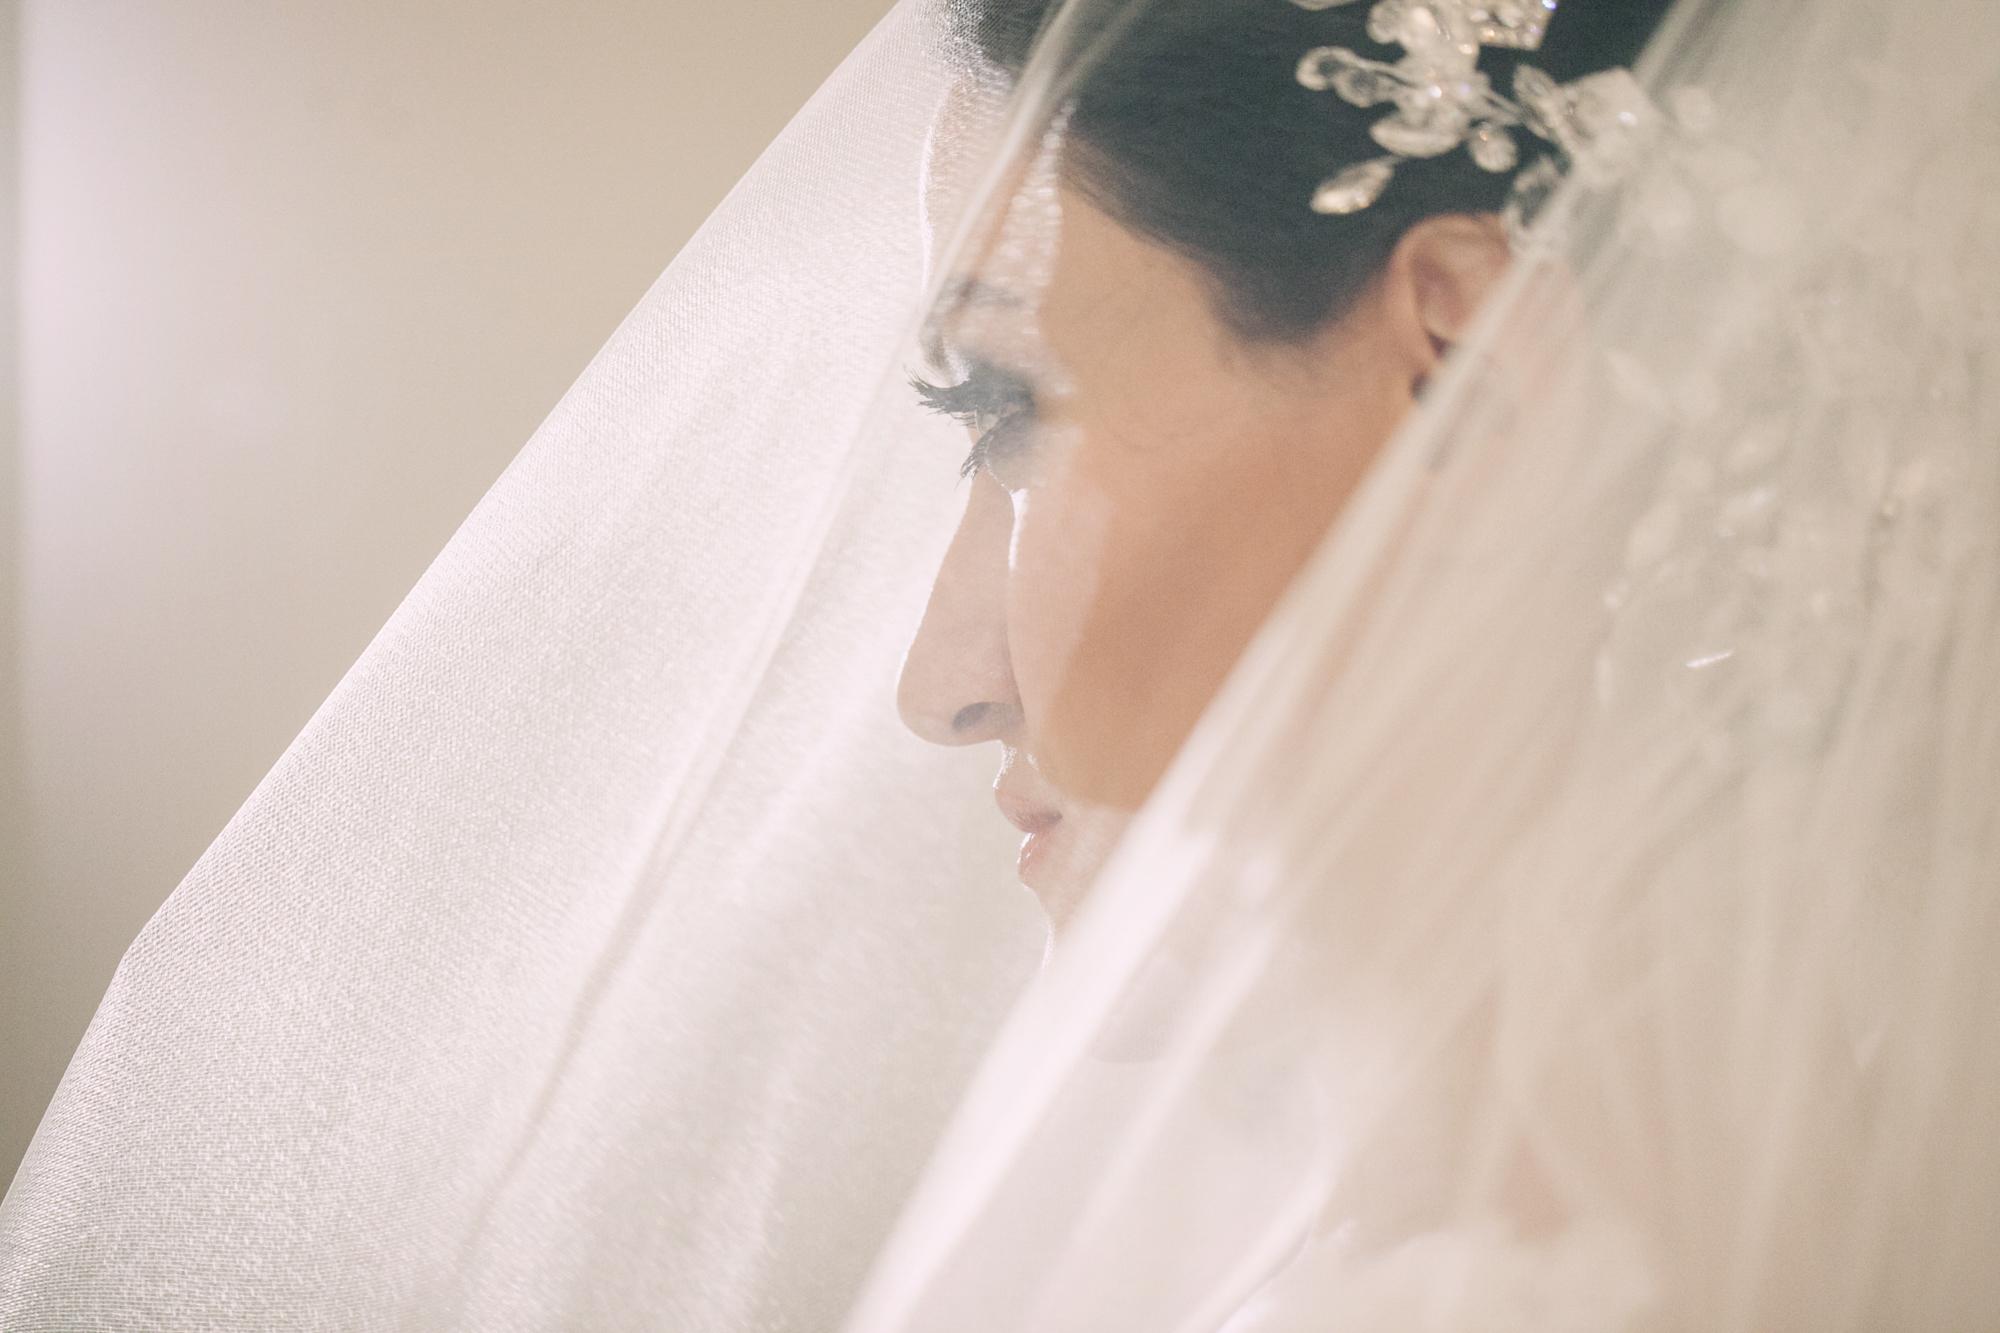 vancouver-luxury-wedding-photographer-lori-miles--7.jpg